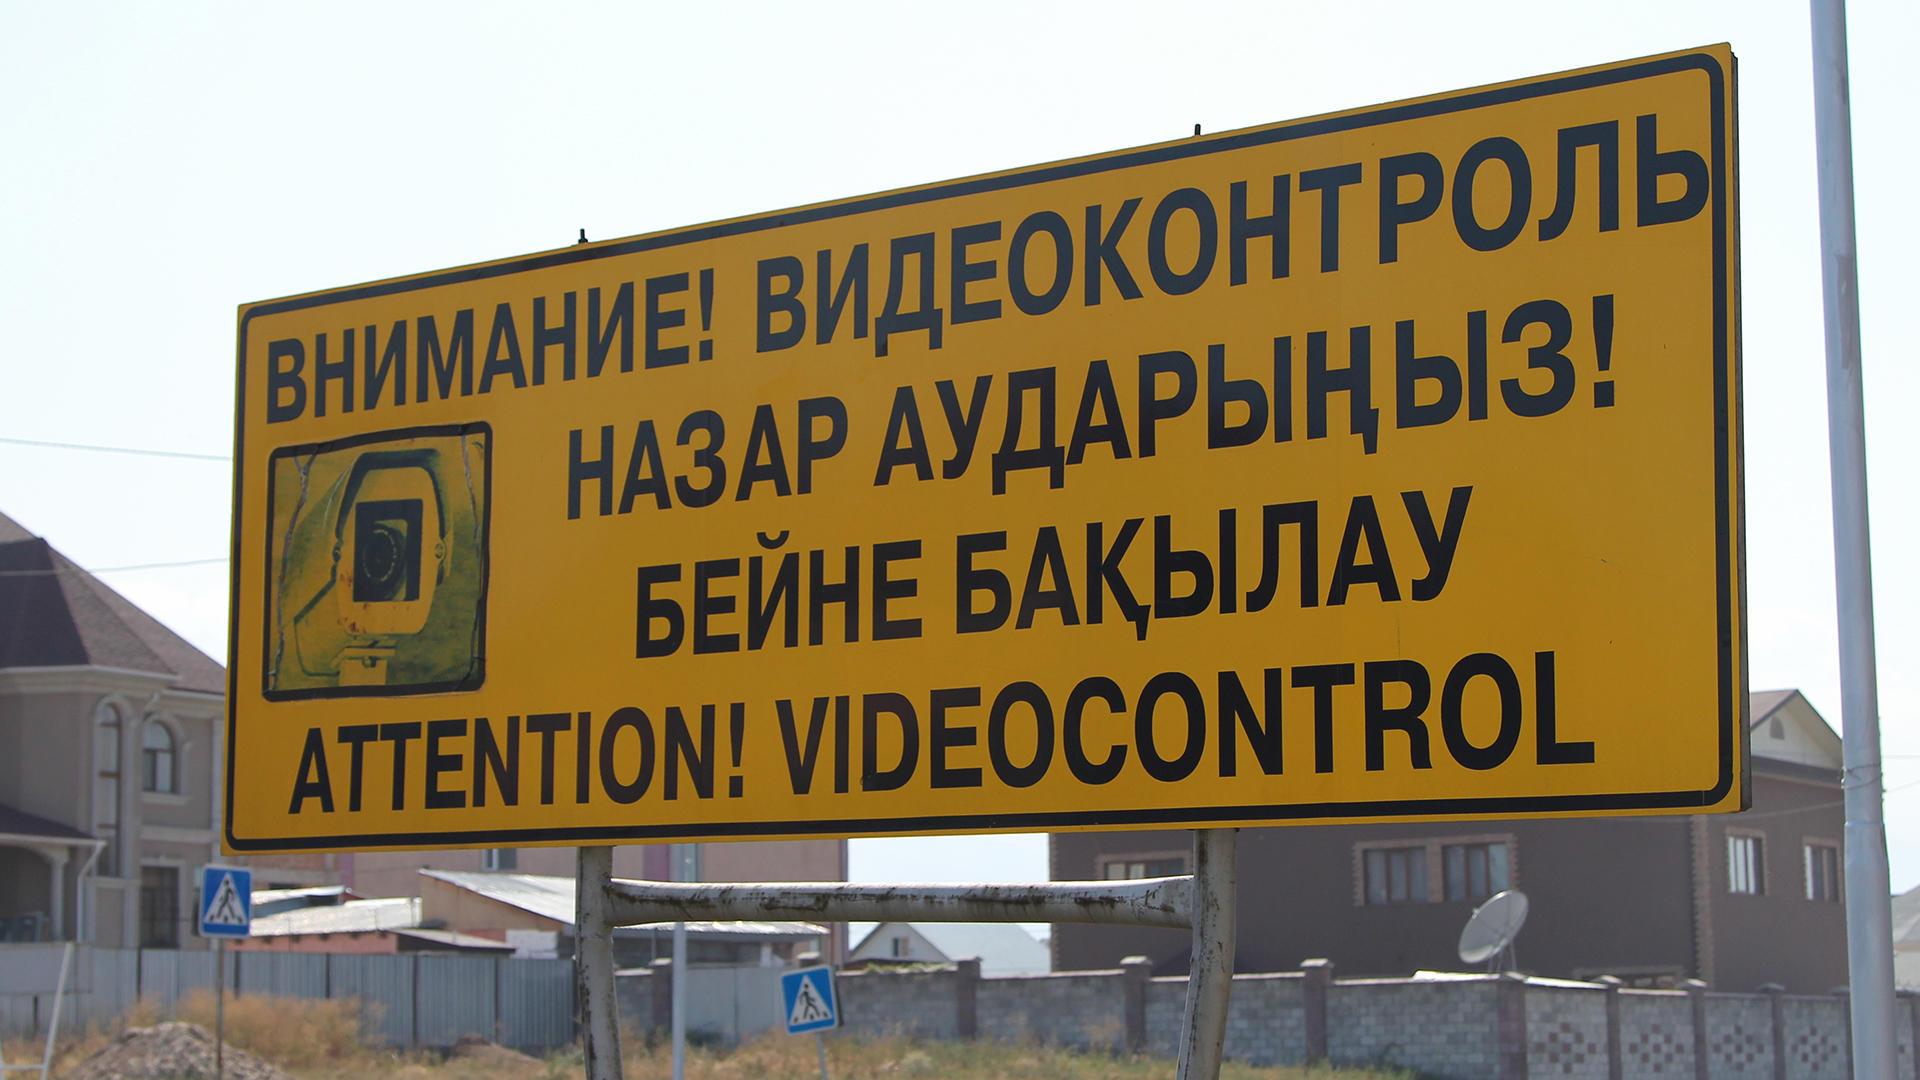 Уберут ли камеры с улиц Алматы?